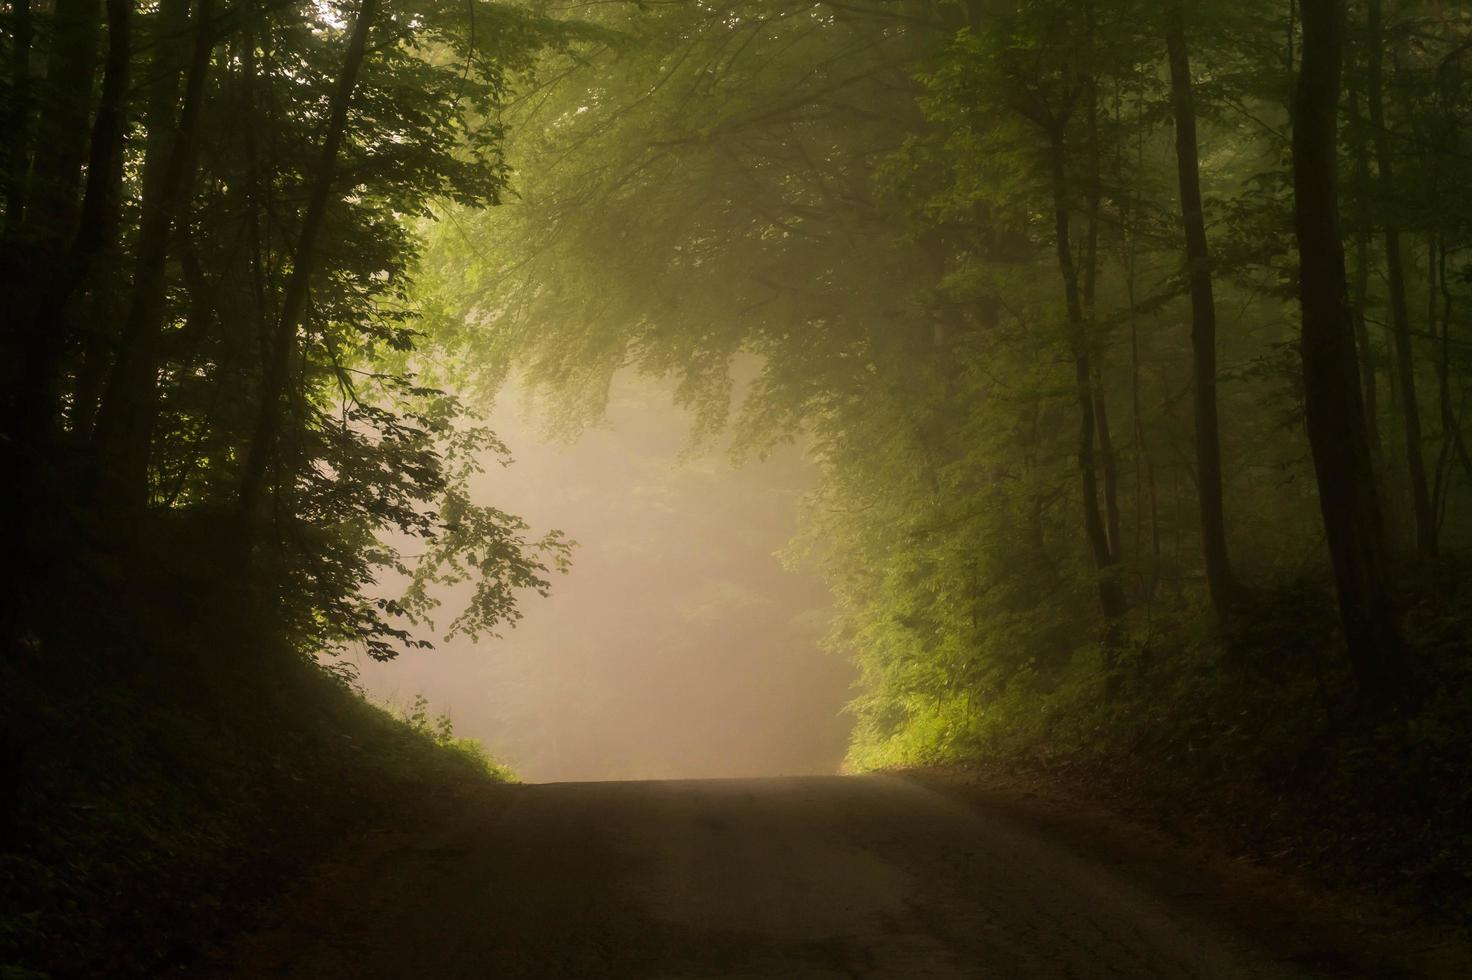 Dirt road thru green forest photo